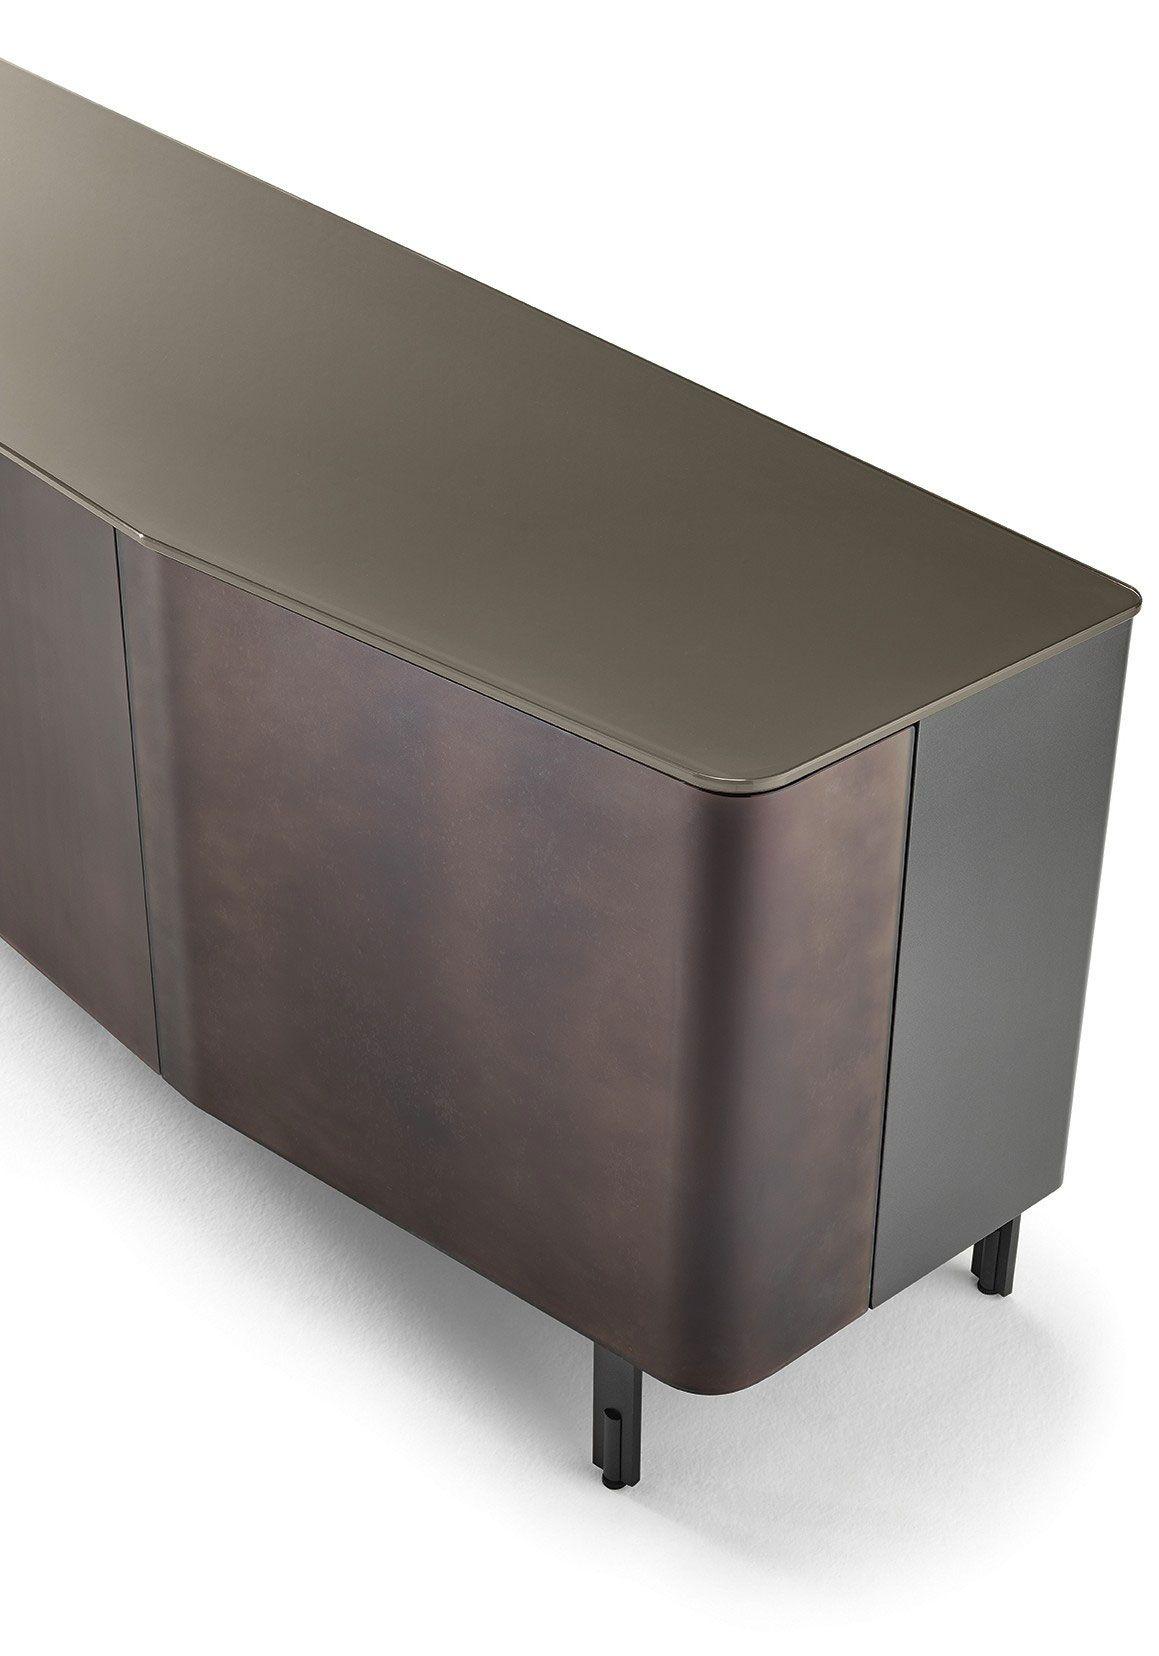 Plana Sideboard Designed By Studio Klass For Fiam Italia